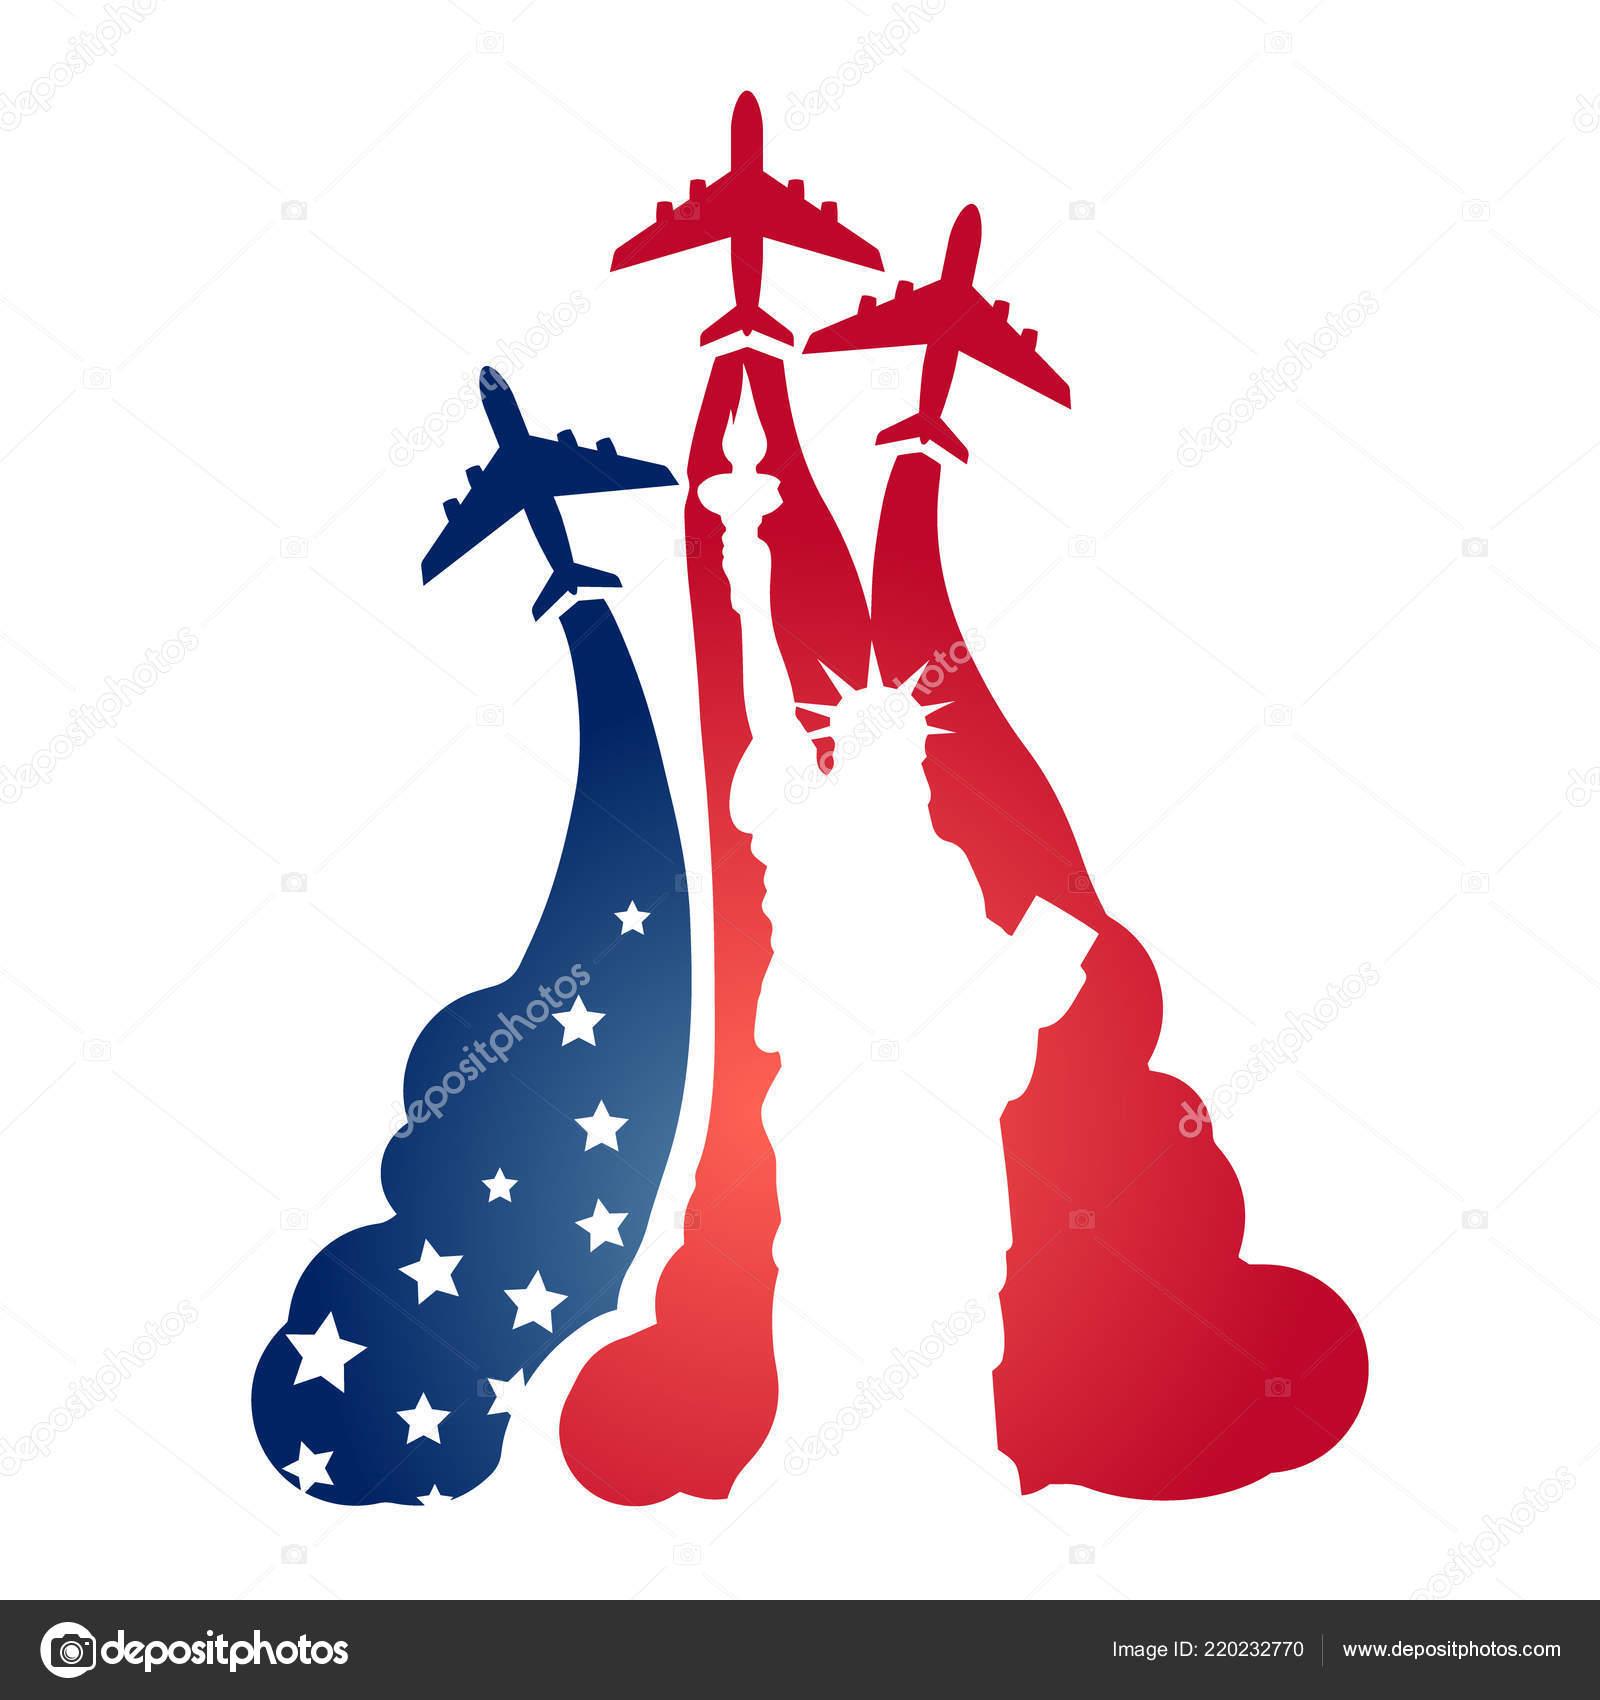 american flag symbolism